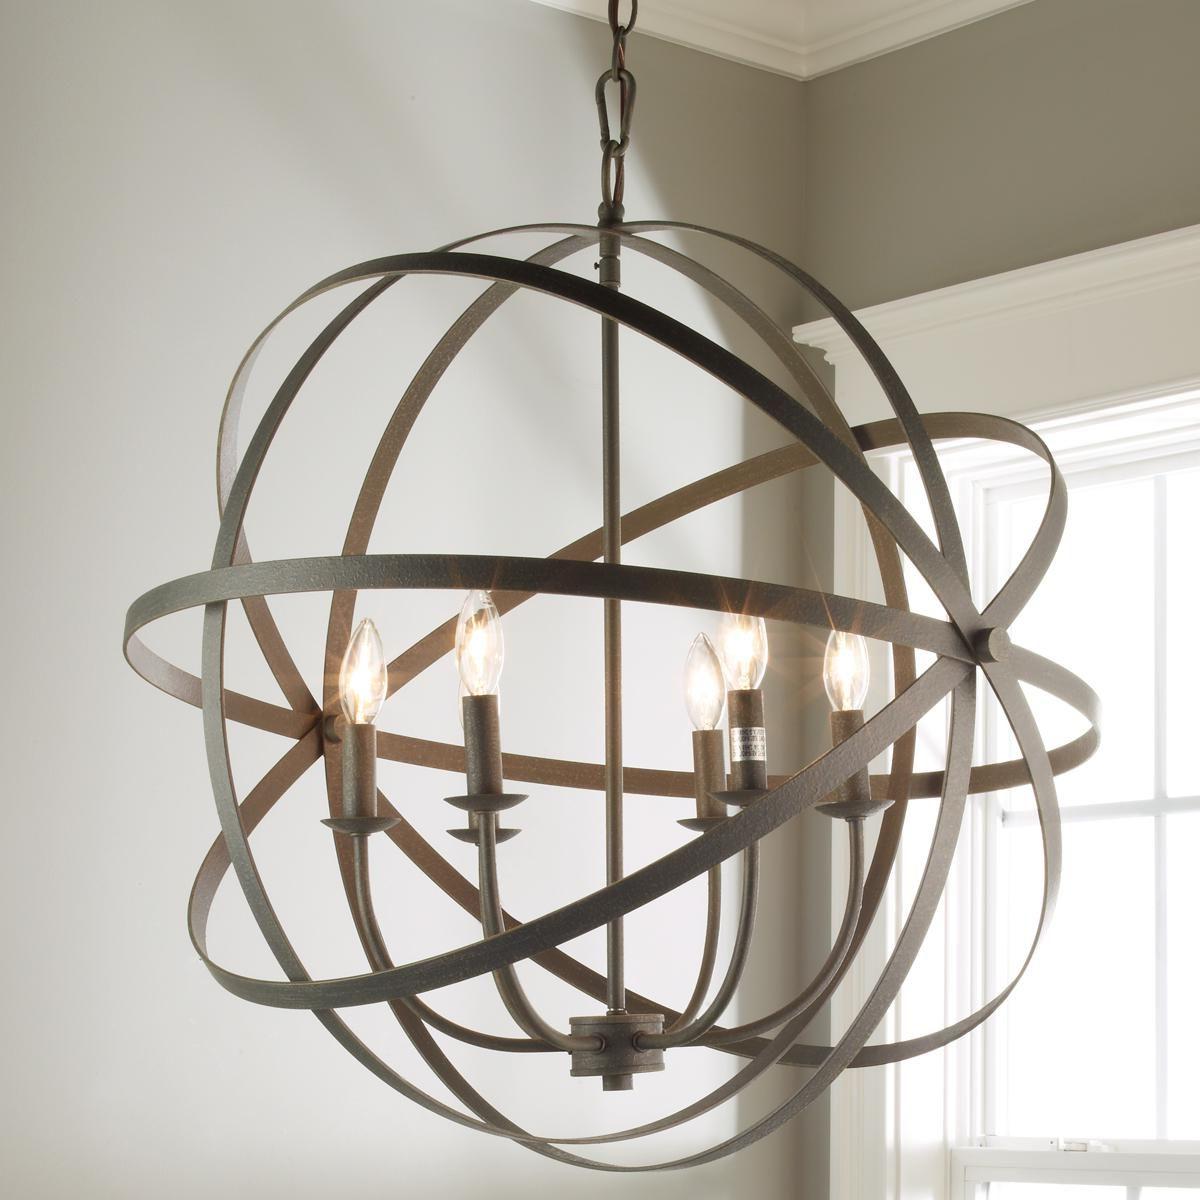 Most Popular Zinc Orbit Globe Chandelier – 6 Light (View 20 of 25)